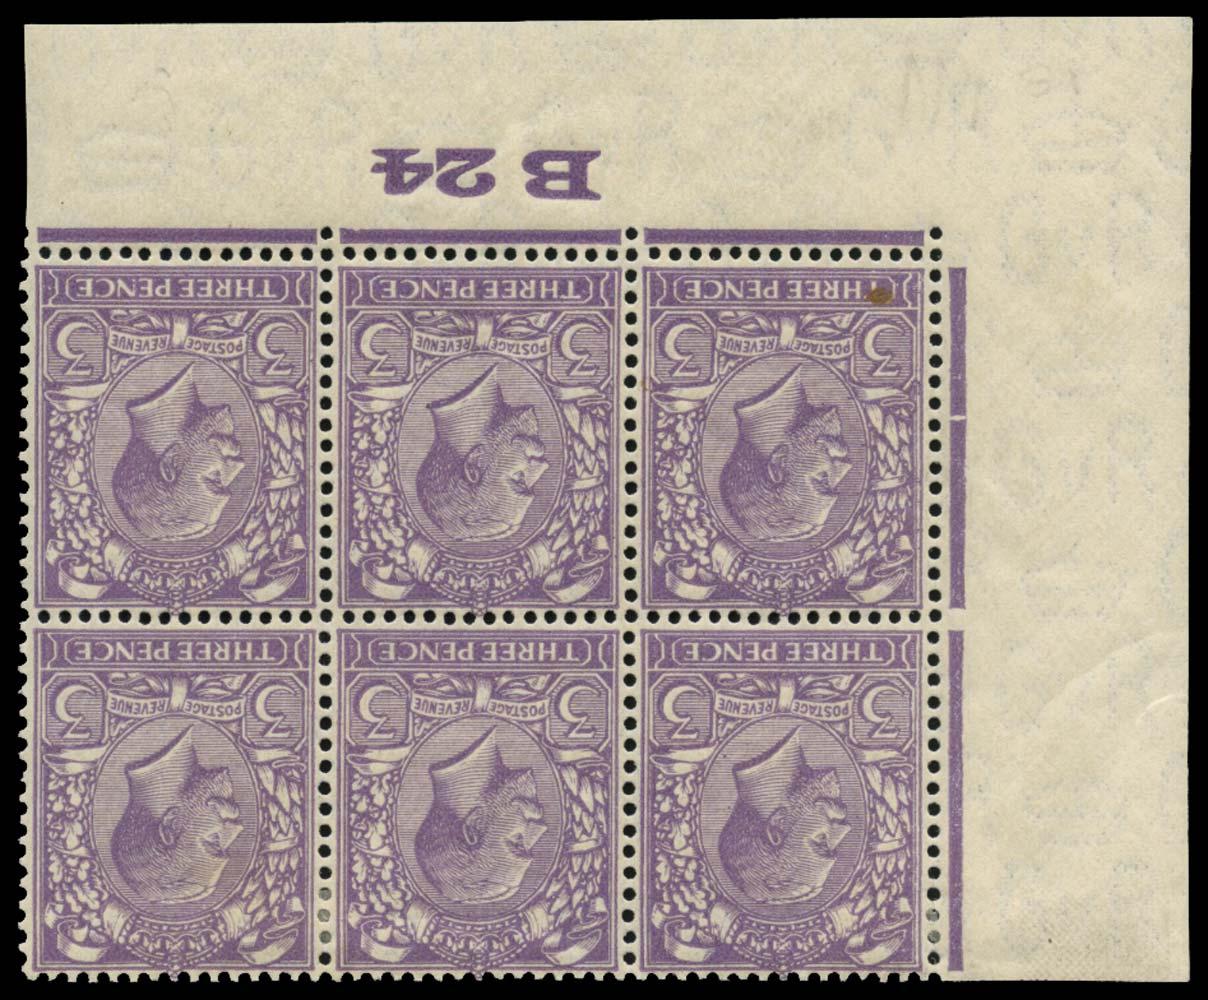 GB 1924  SG423var wi Mint watermark inverted B24 control block